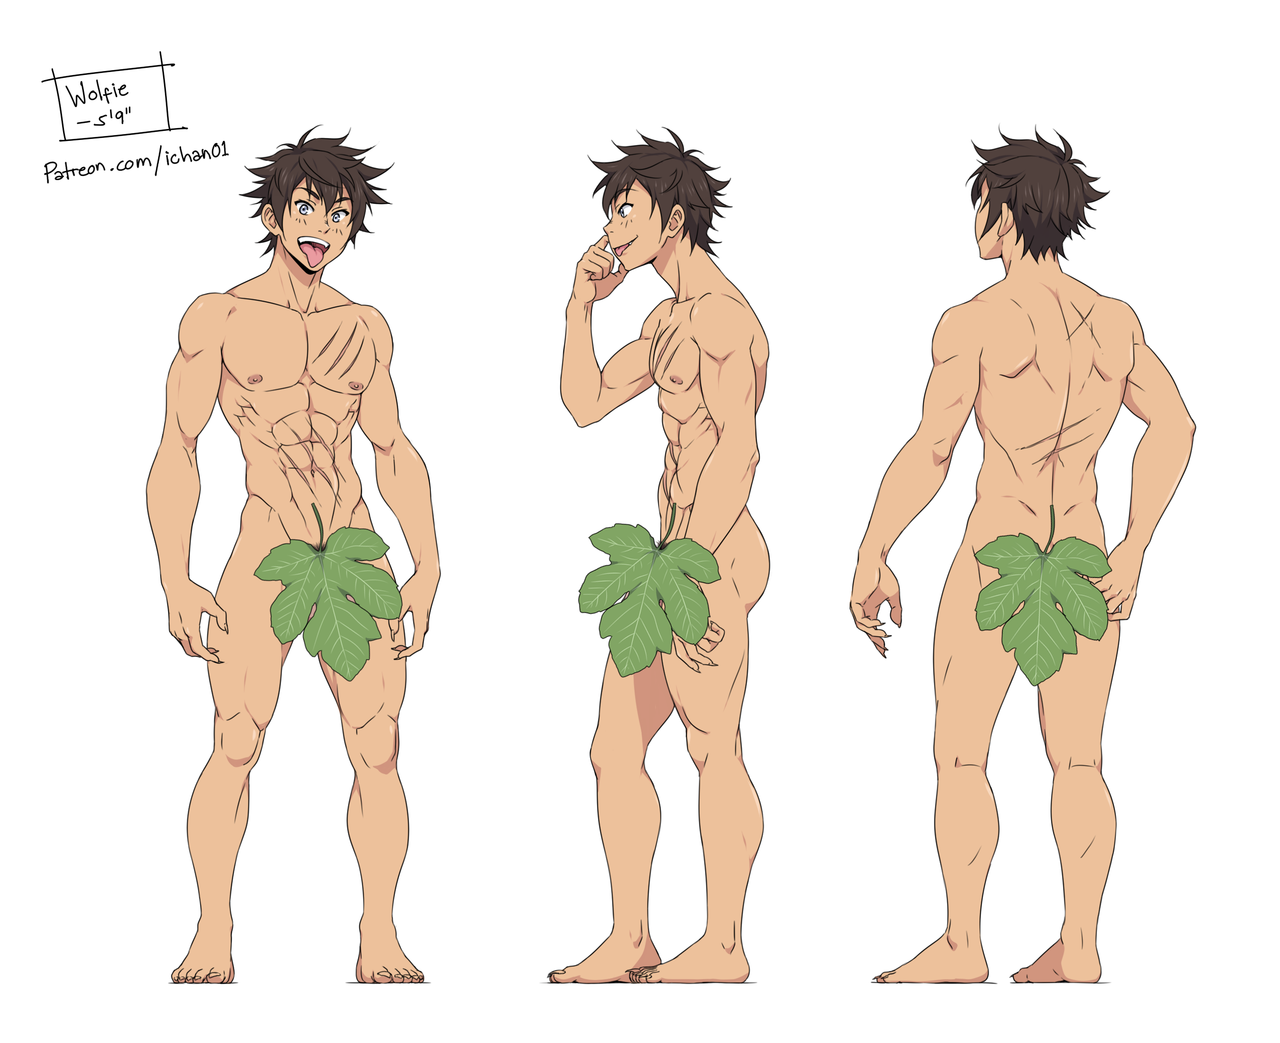 Drawn wolfman buff body Manga sketches png Pinterest referencias